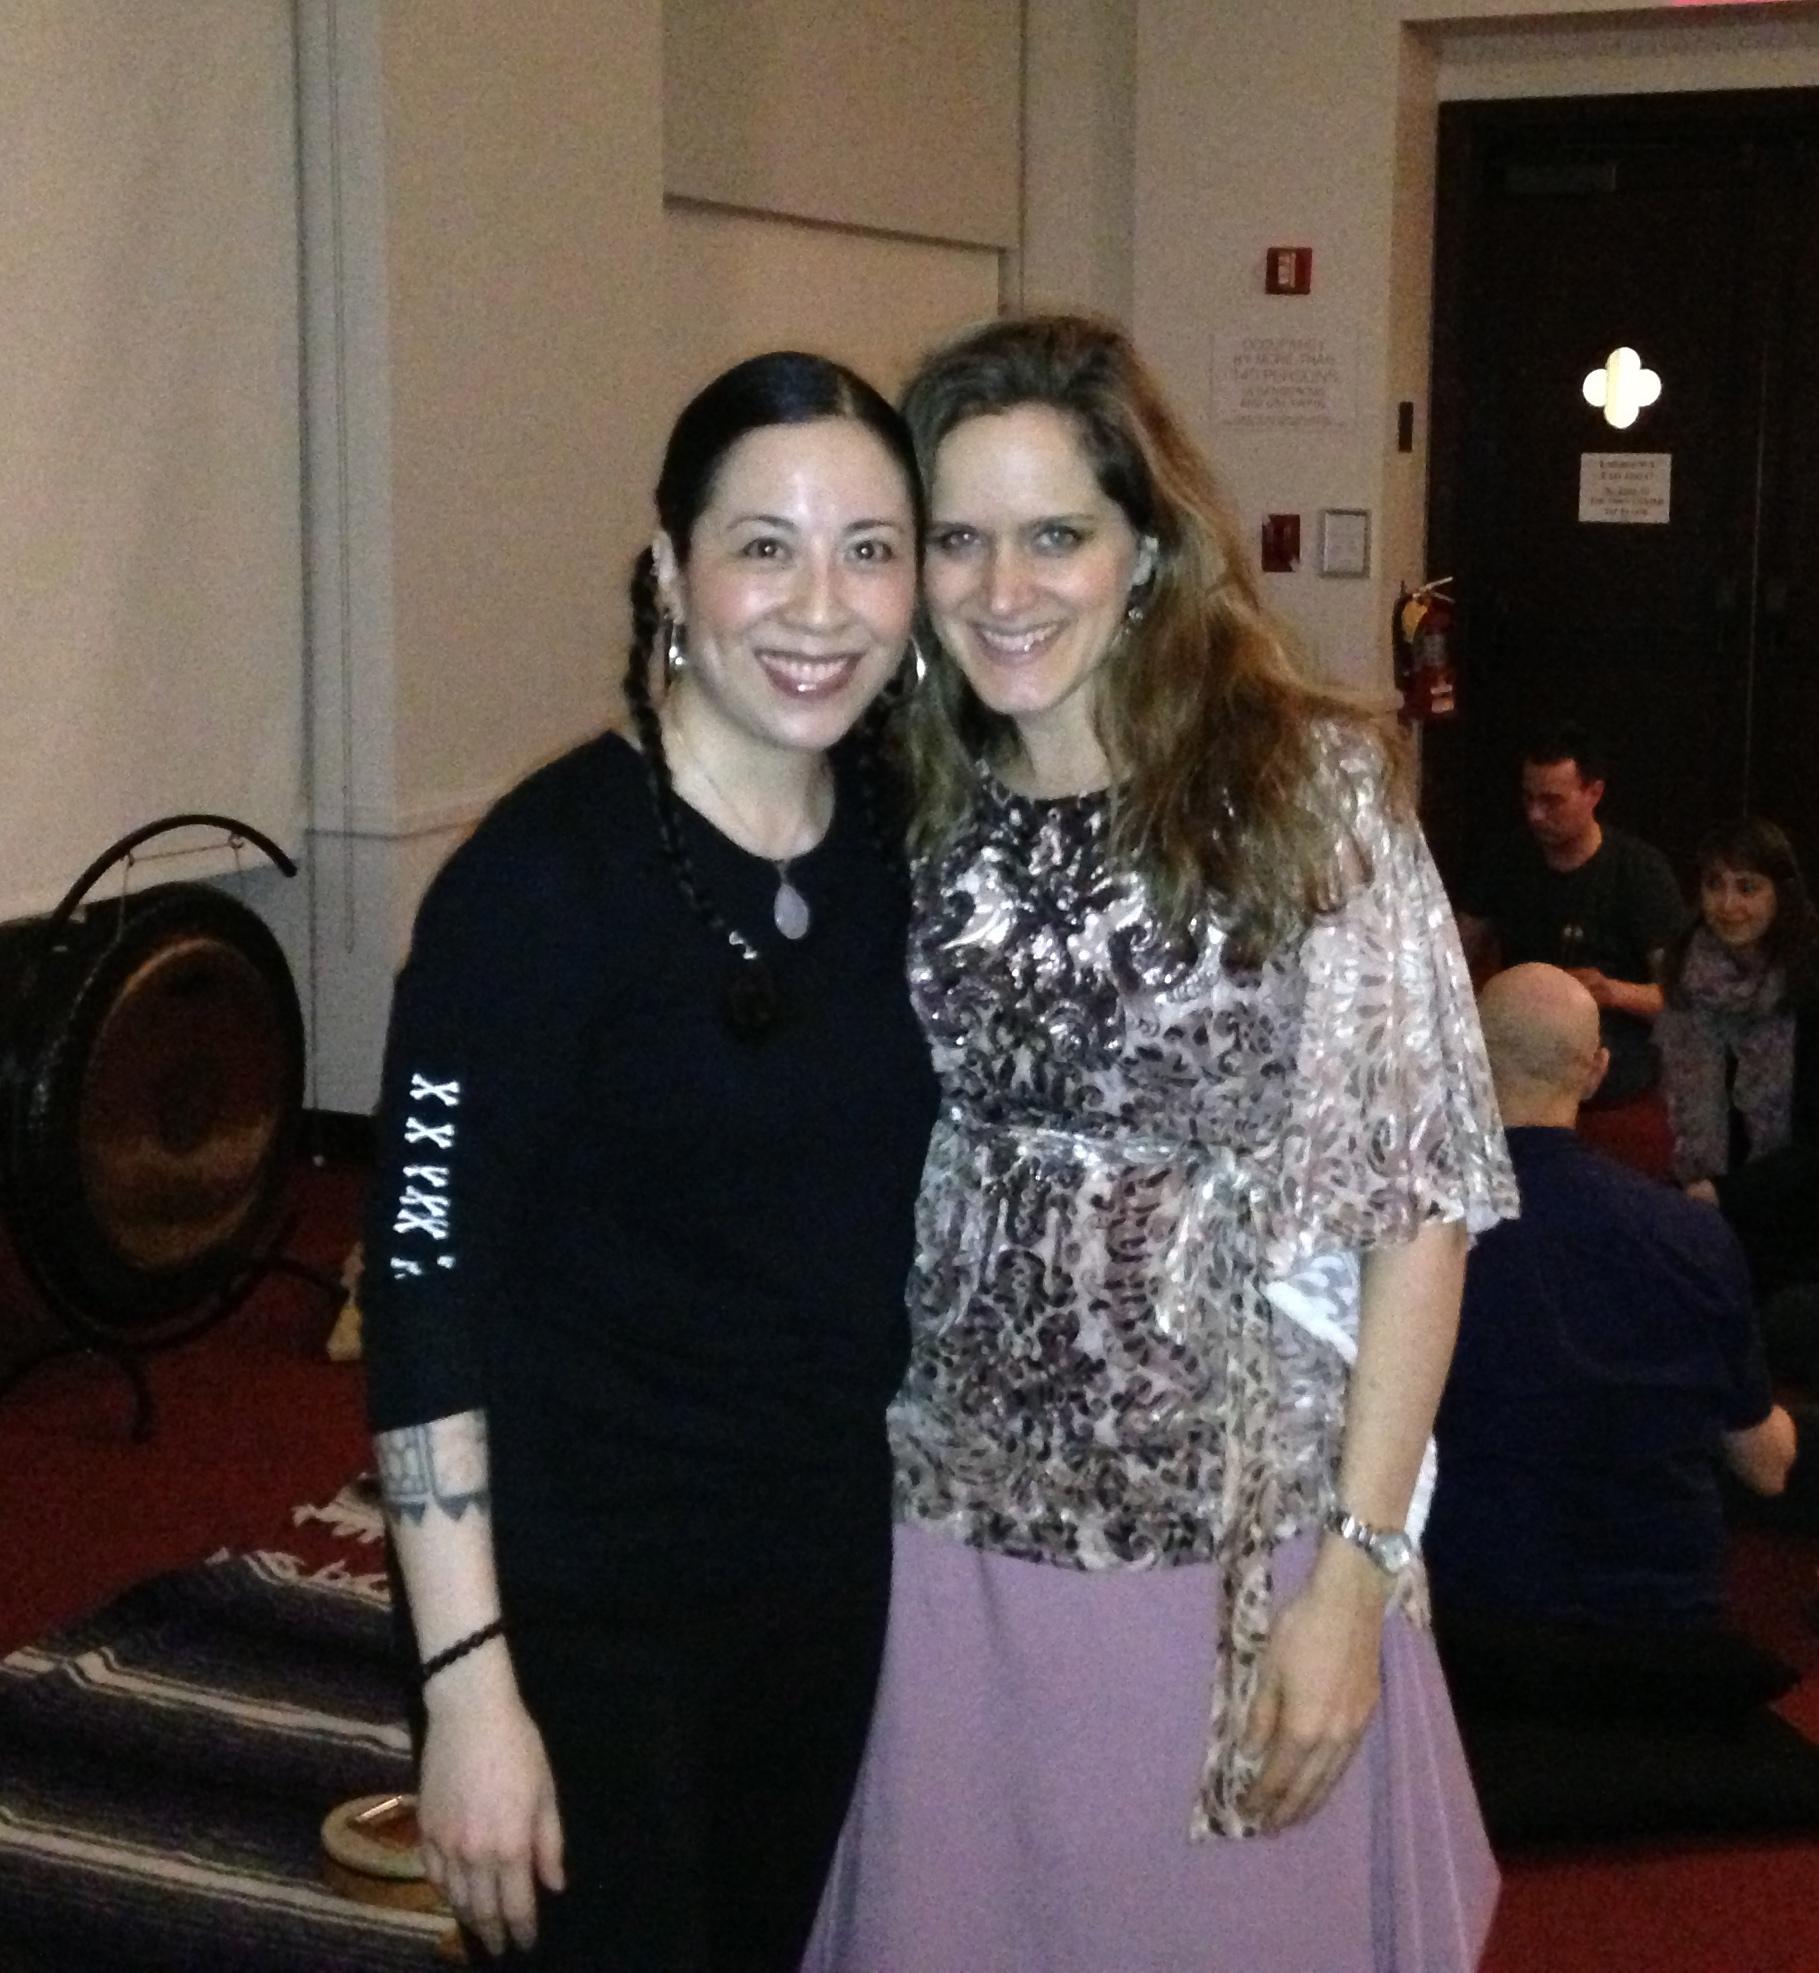 Joule L'adara and I at last Saturday's Sound Soak concert.